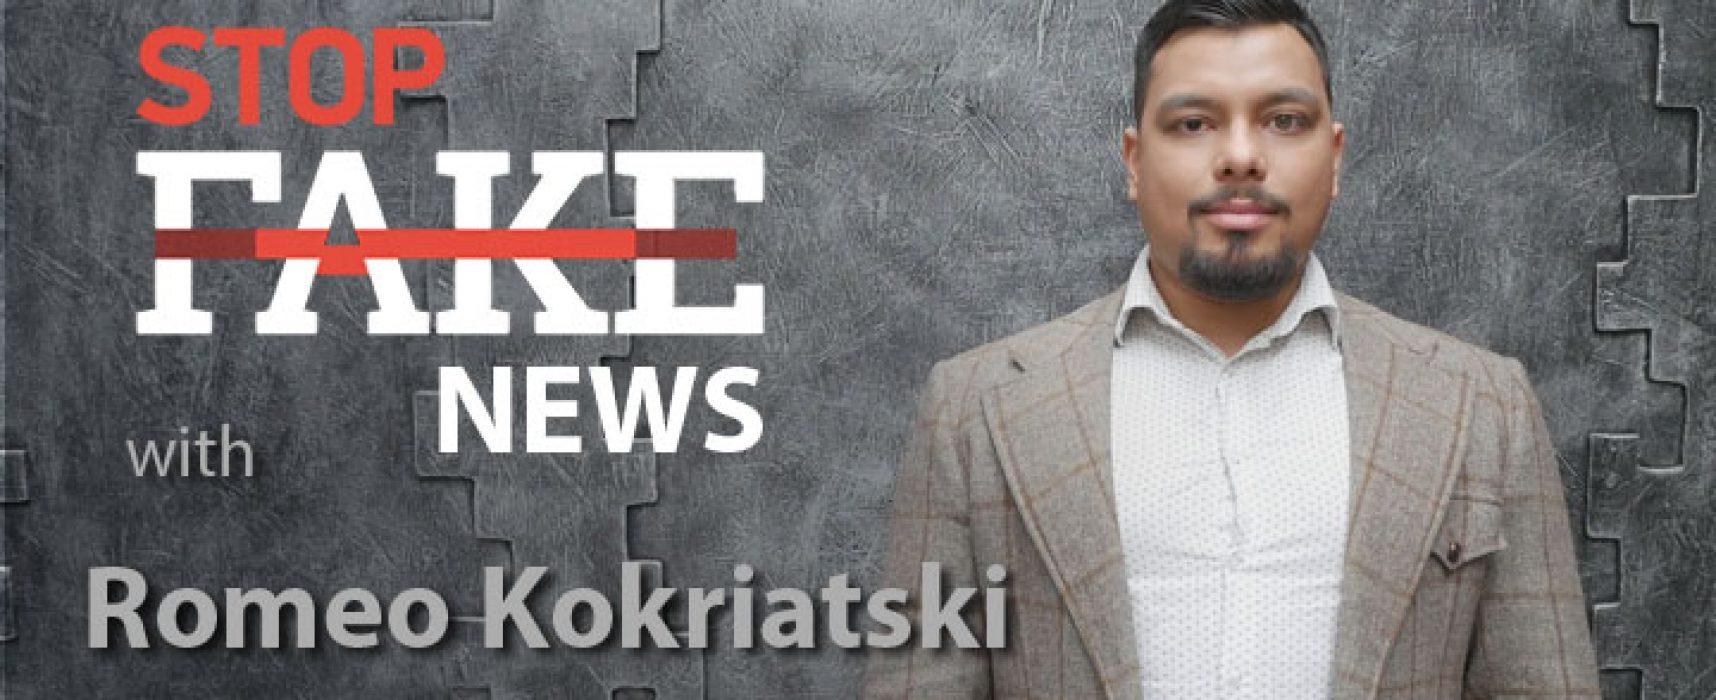 StopFakeNews #128 with Romeo Kokriatski